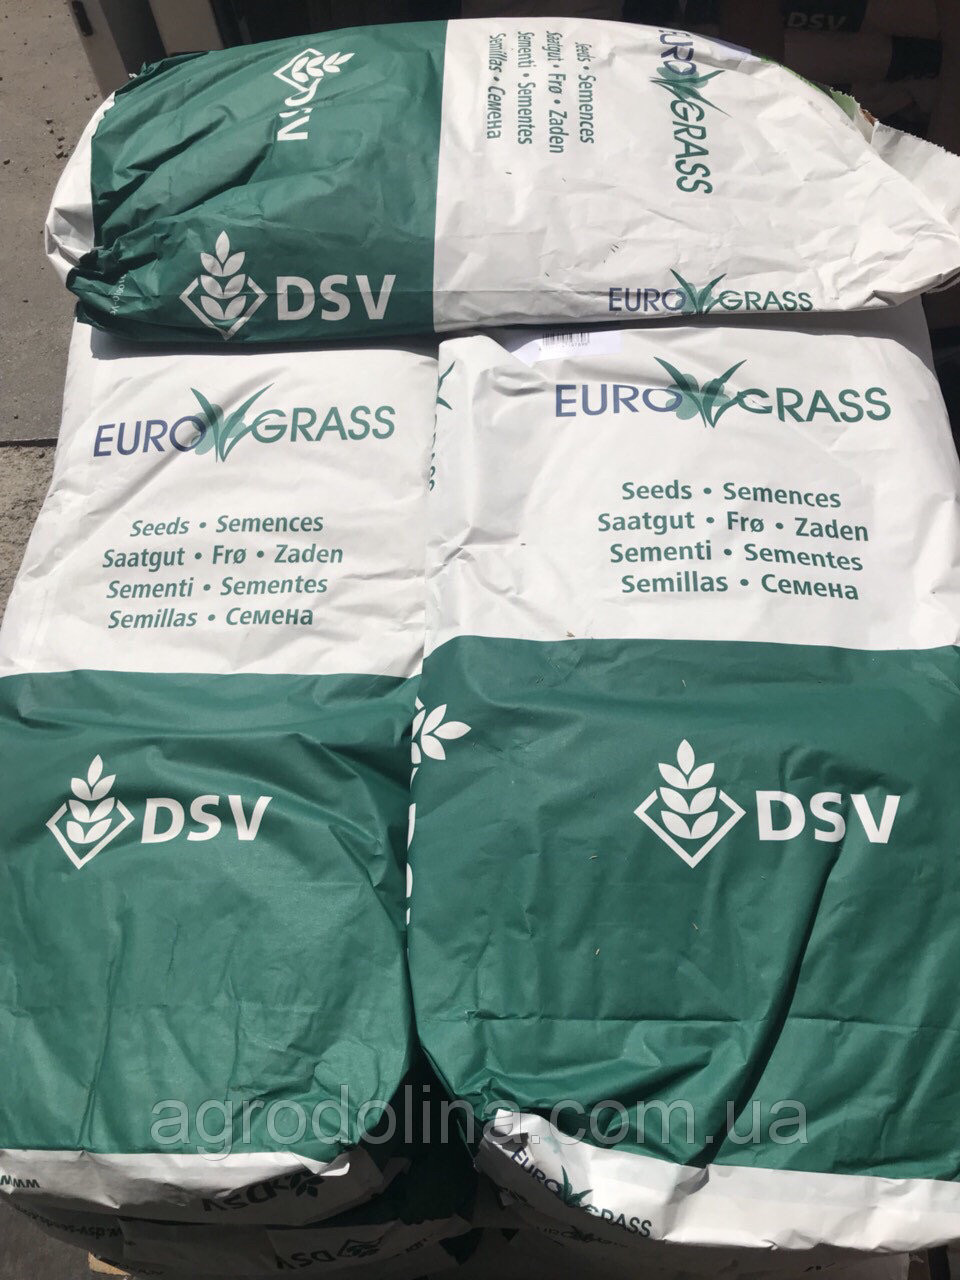 Газонная трава DSV (Euro Grass) Shade Теневая 10 кг, Германия